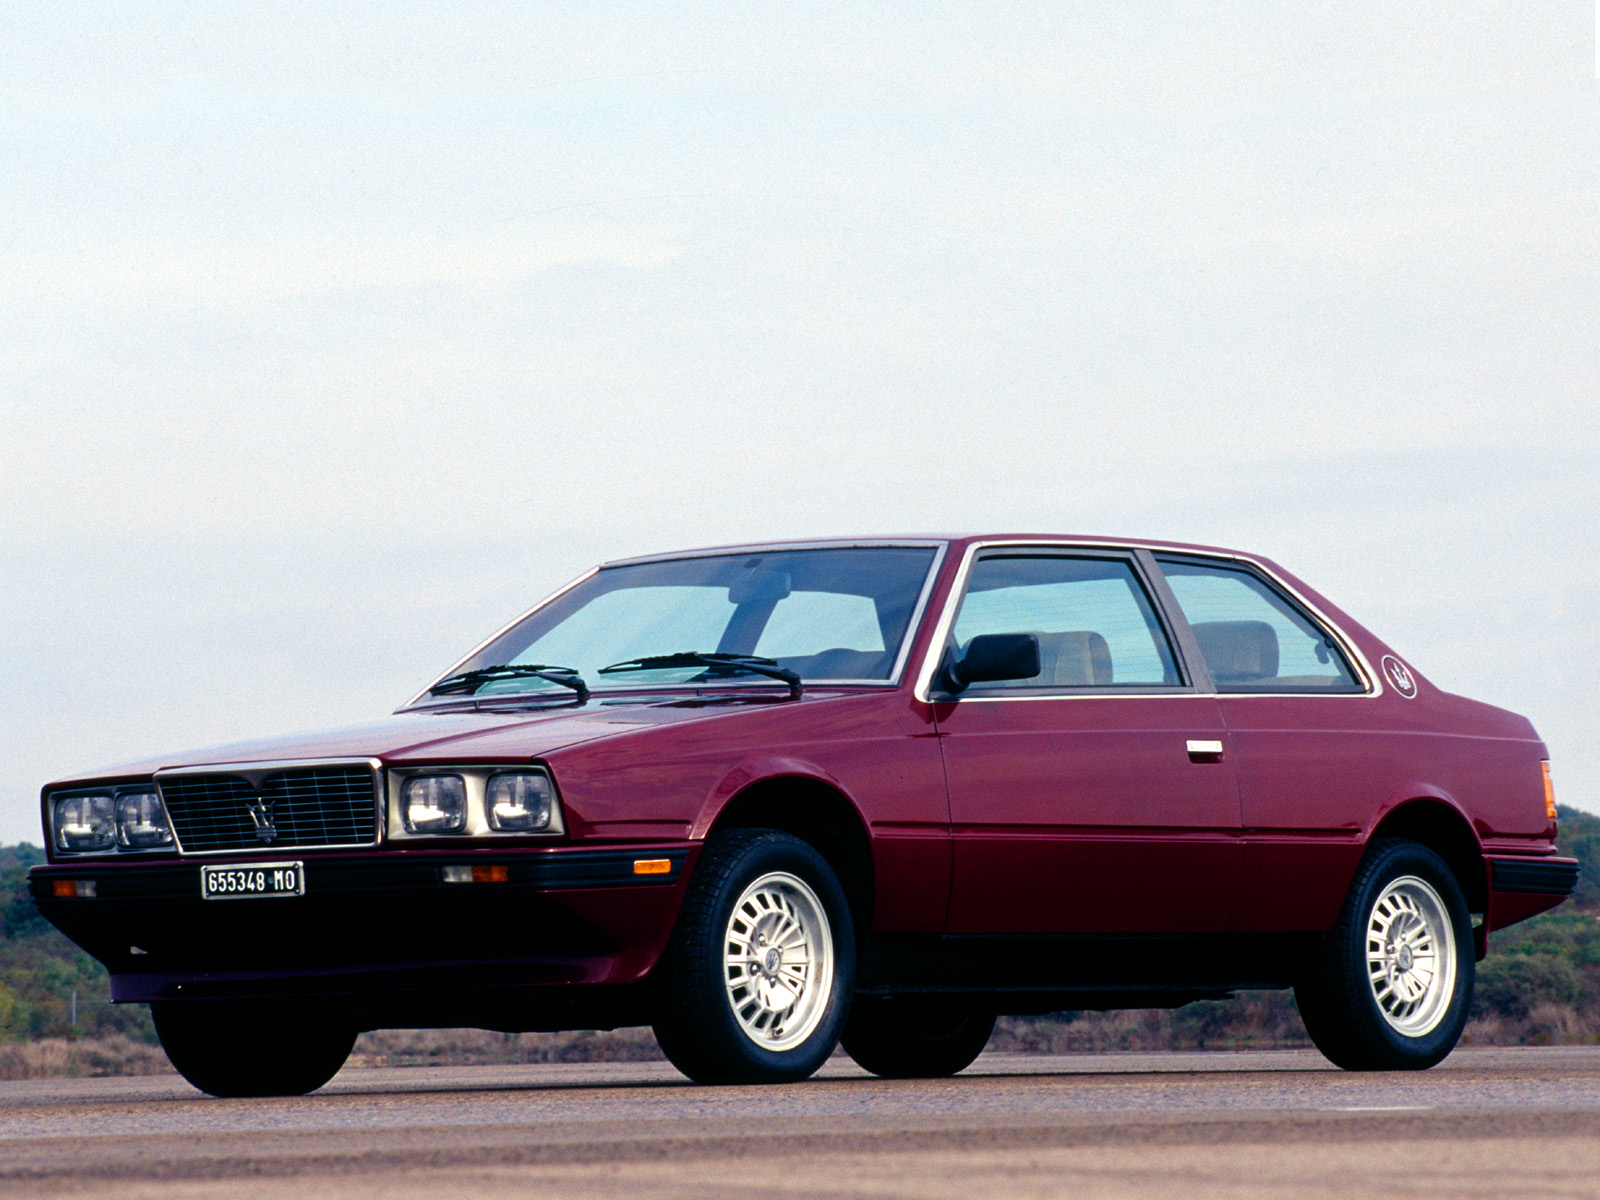 Maserati Biturbo, 1981